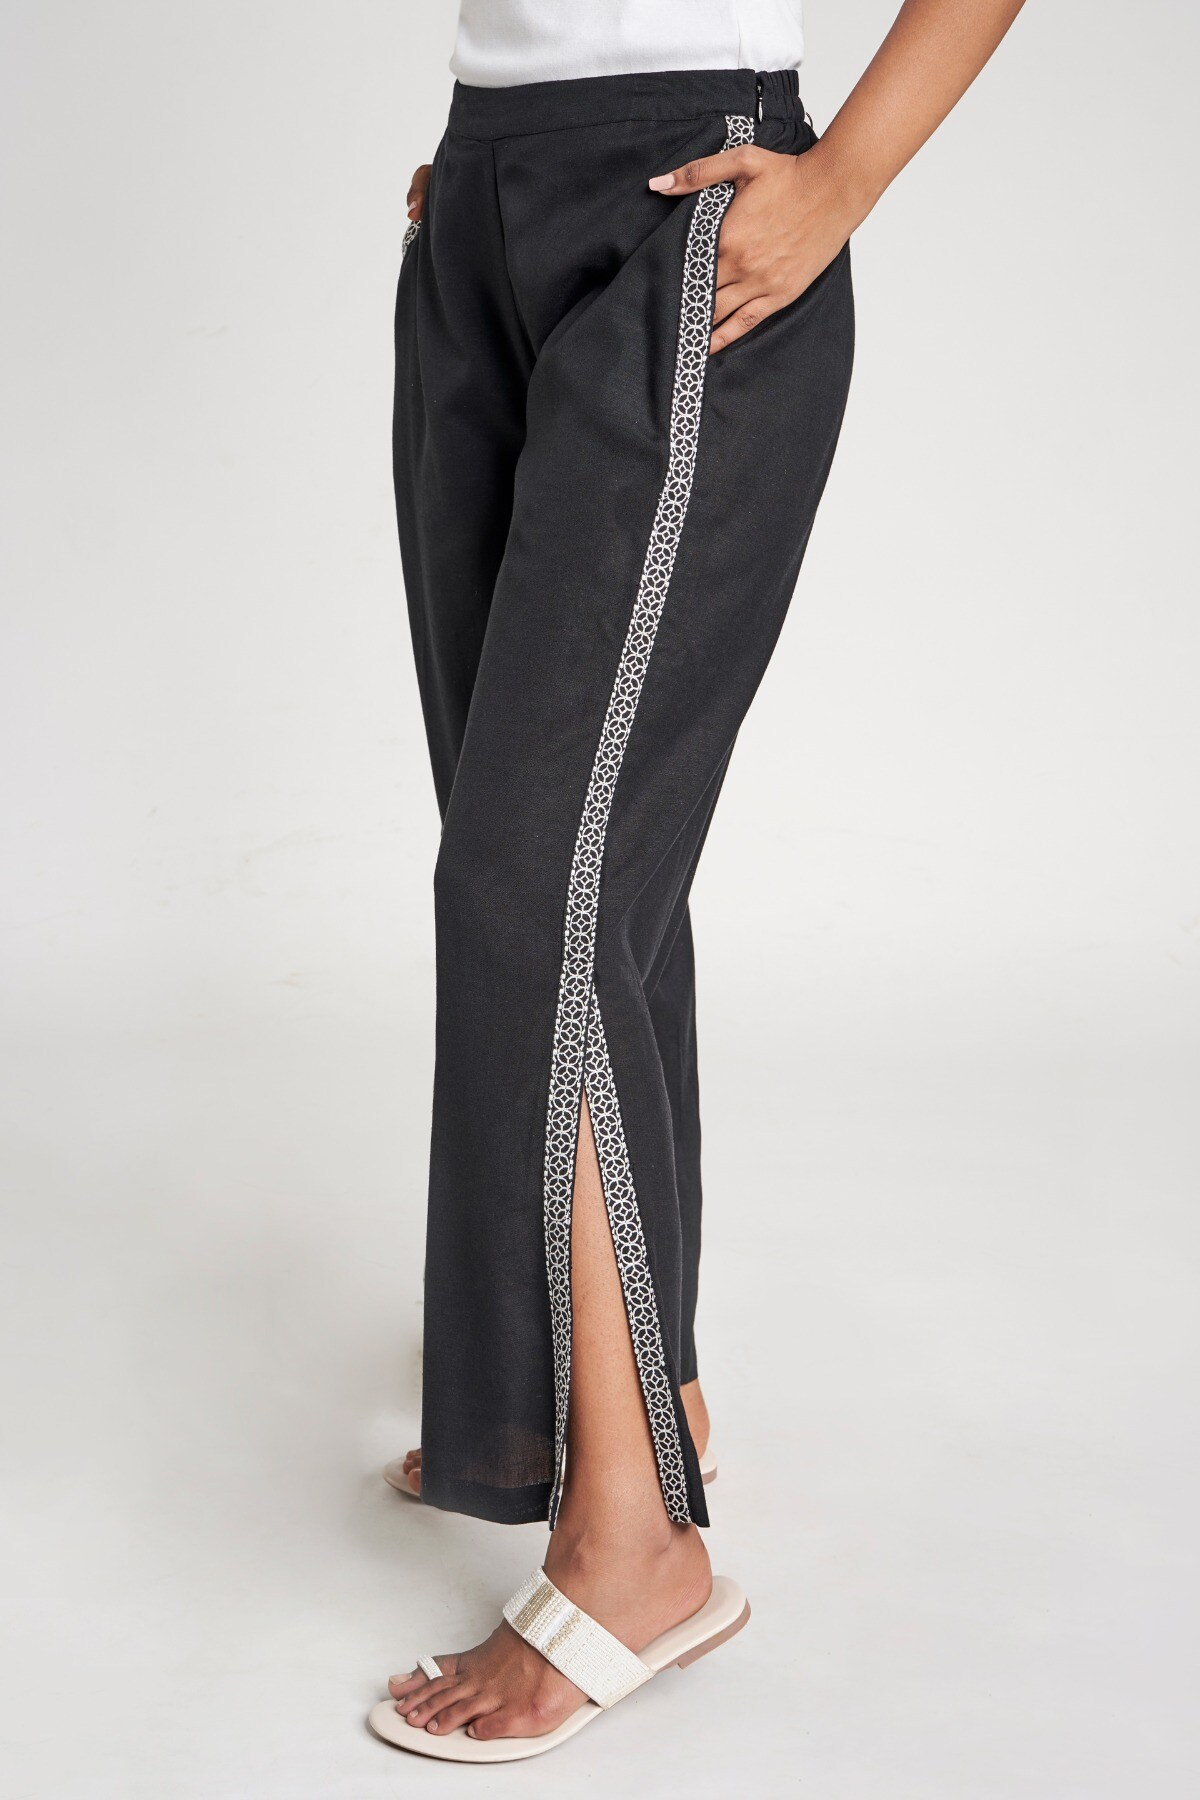 Global Desi | Black Solid Embroidered Bottom